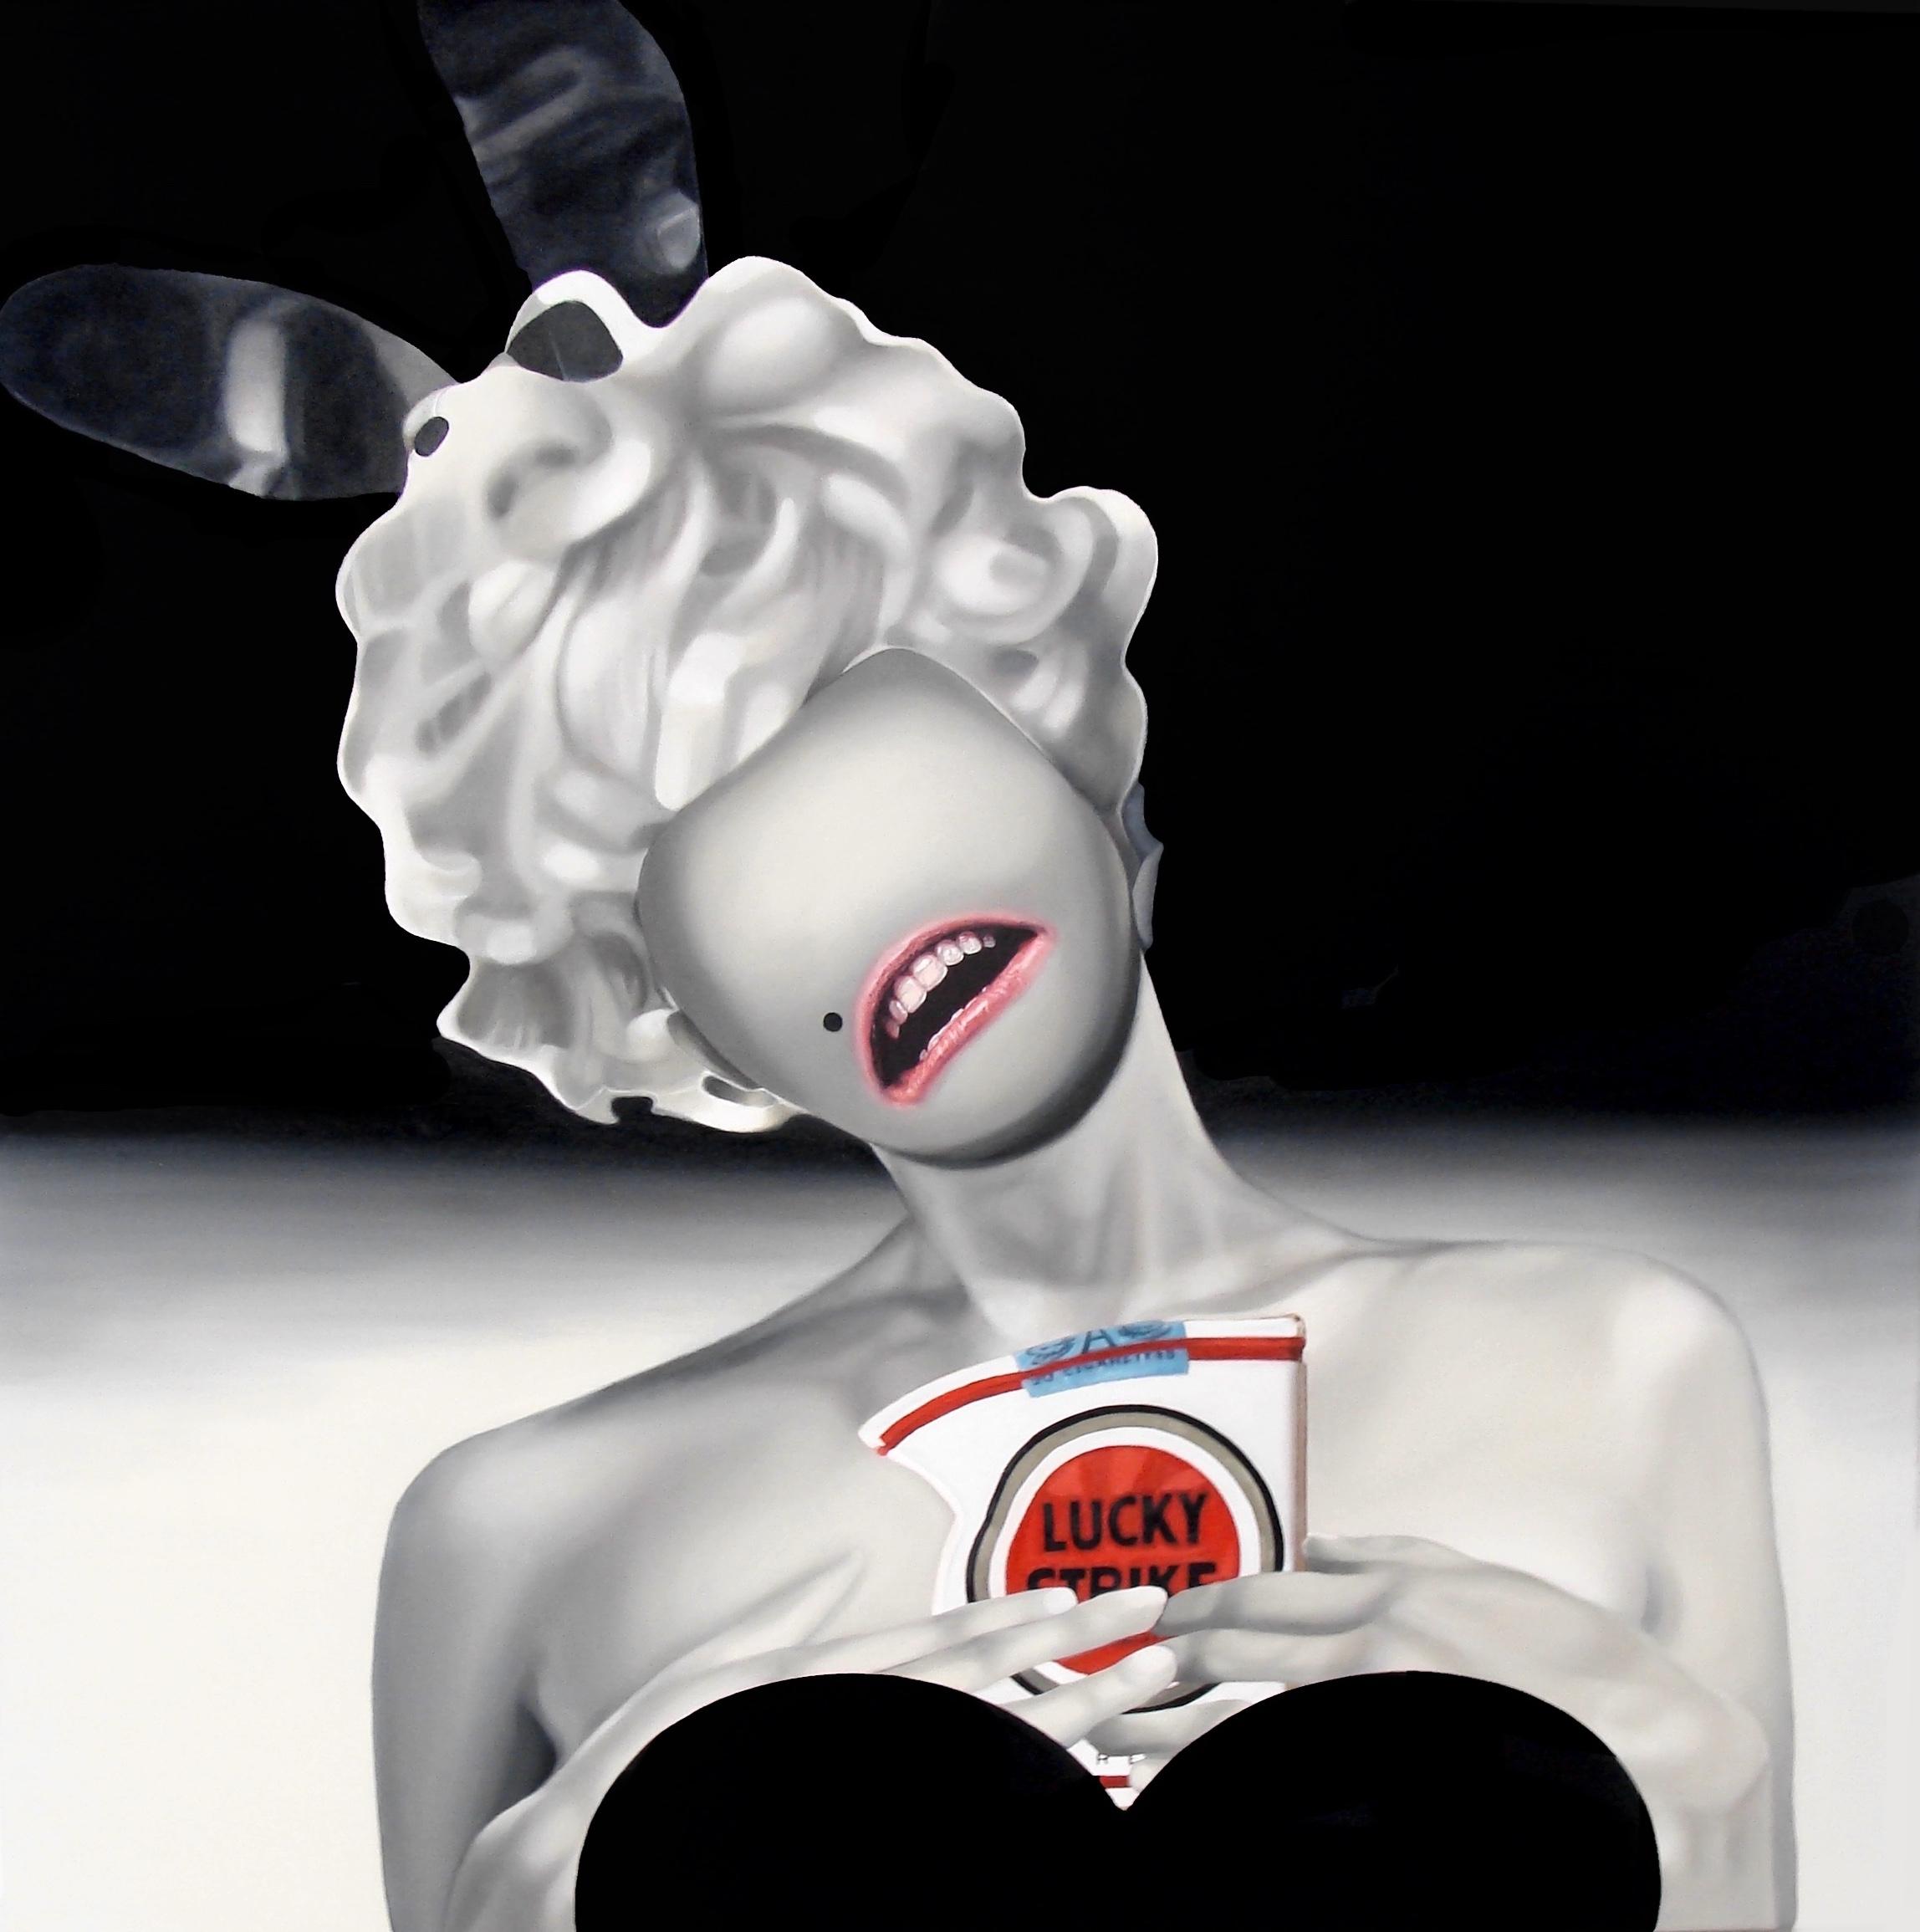 Teiji Hayama's New Paintings Examine FAME